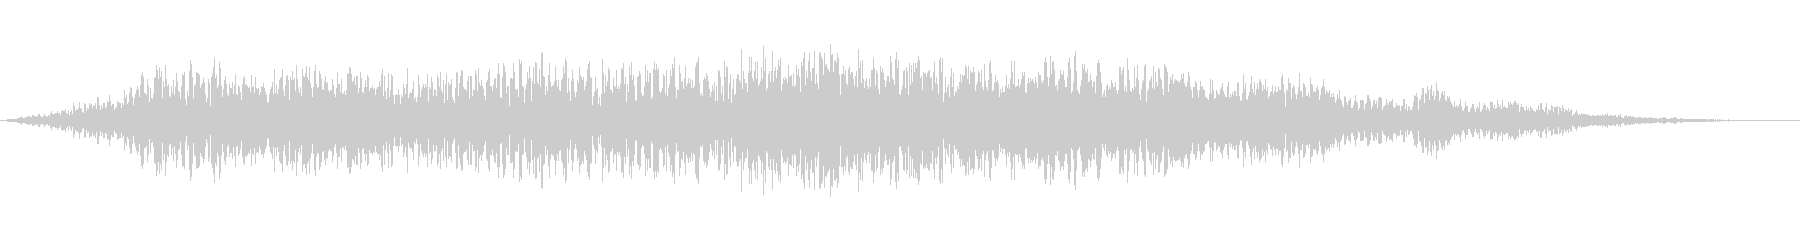 DISTANT REALM 3の未再生の波形